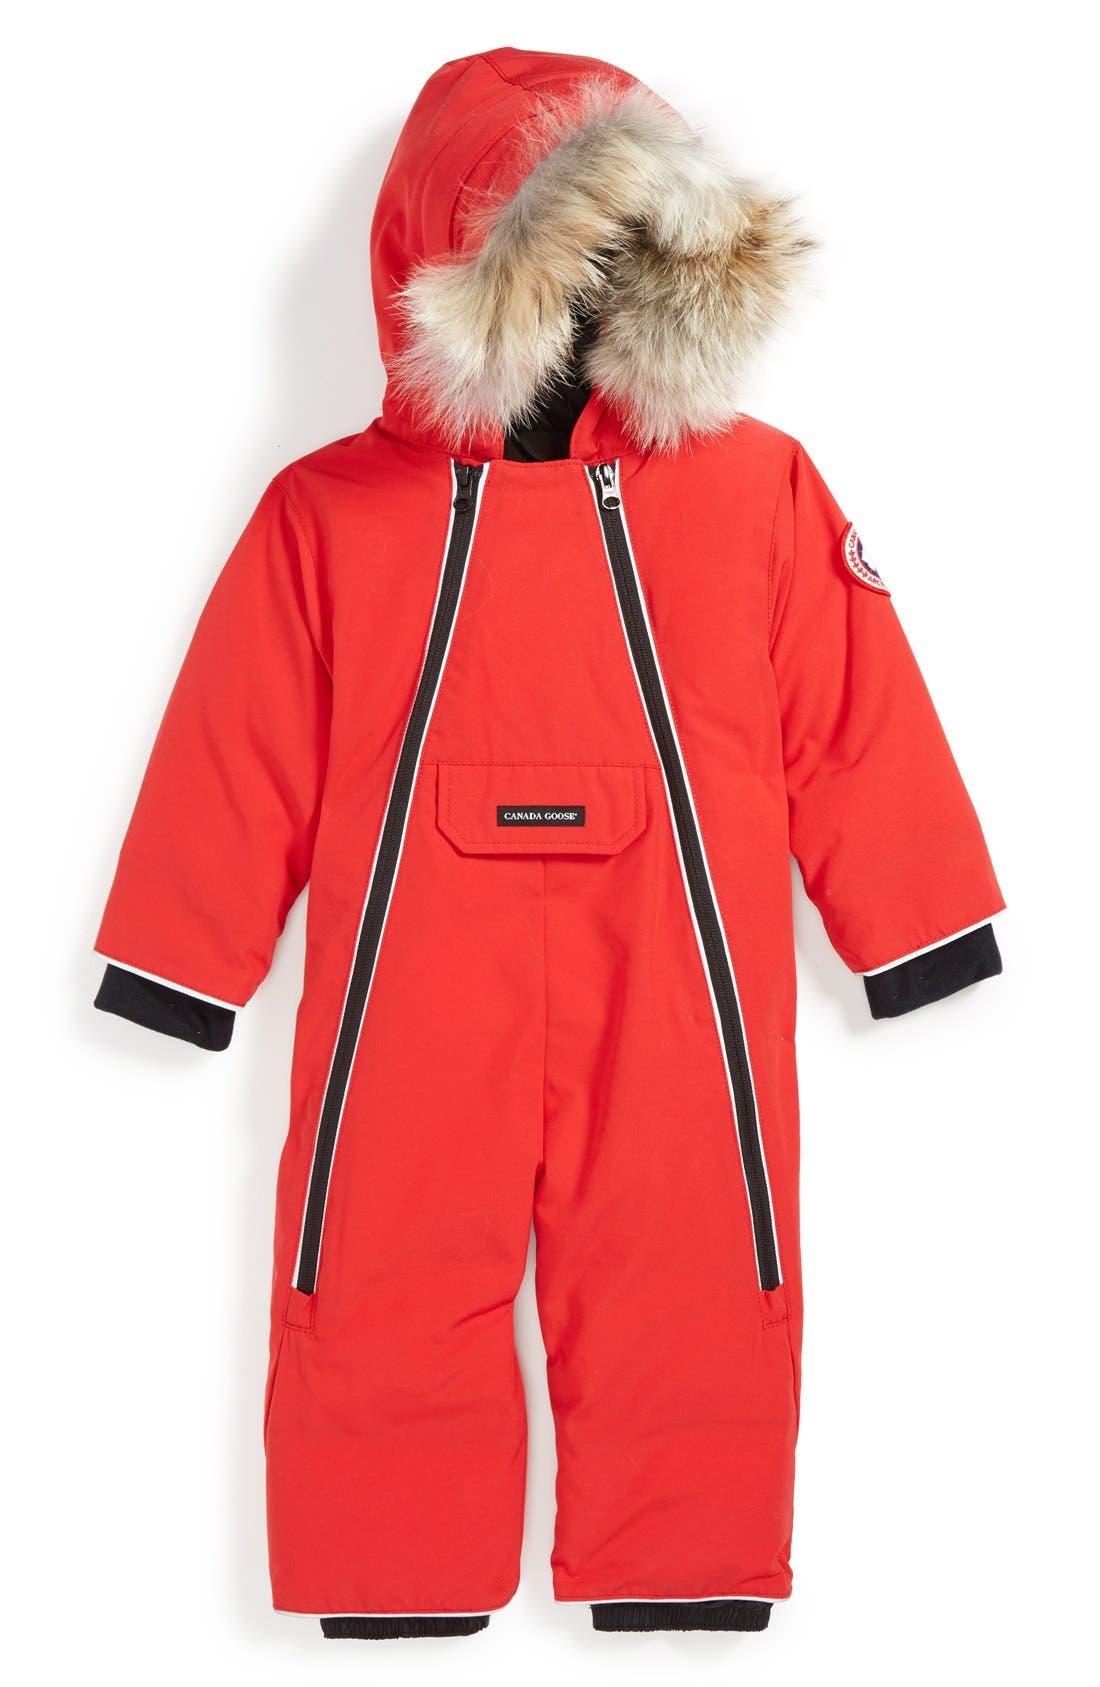 CANADA GOOSE 'Lamb' Down Snowsuit with Genuine Coyote Fur Trim, Main, color, RED